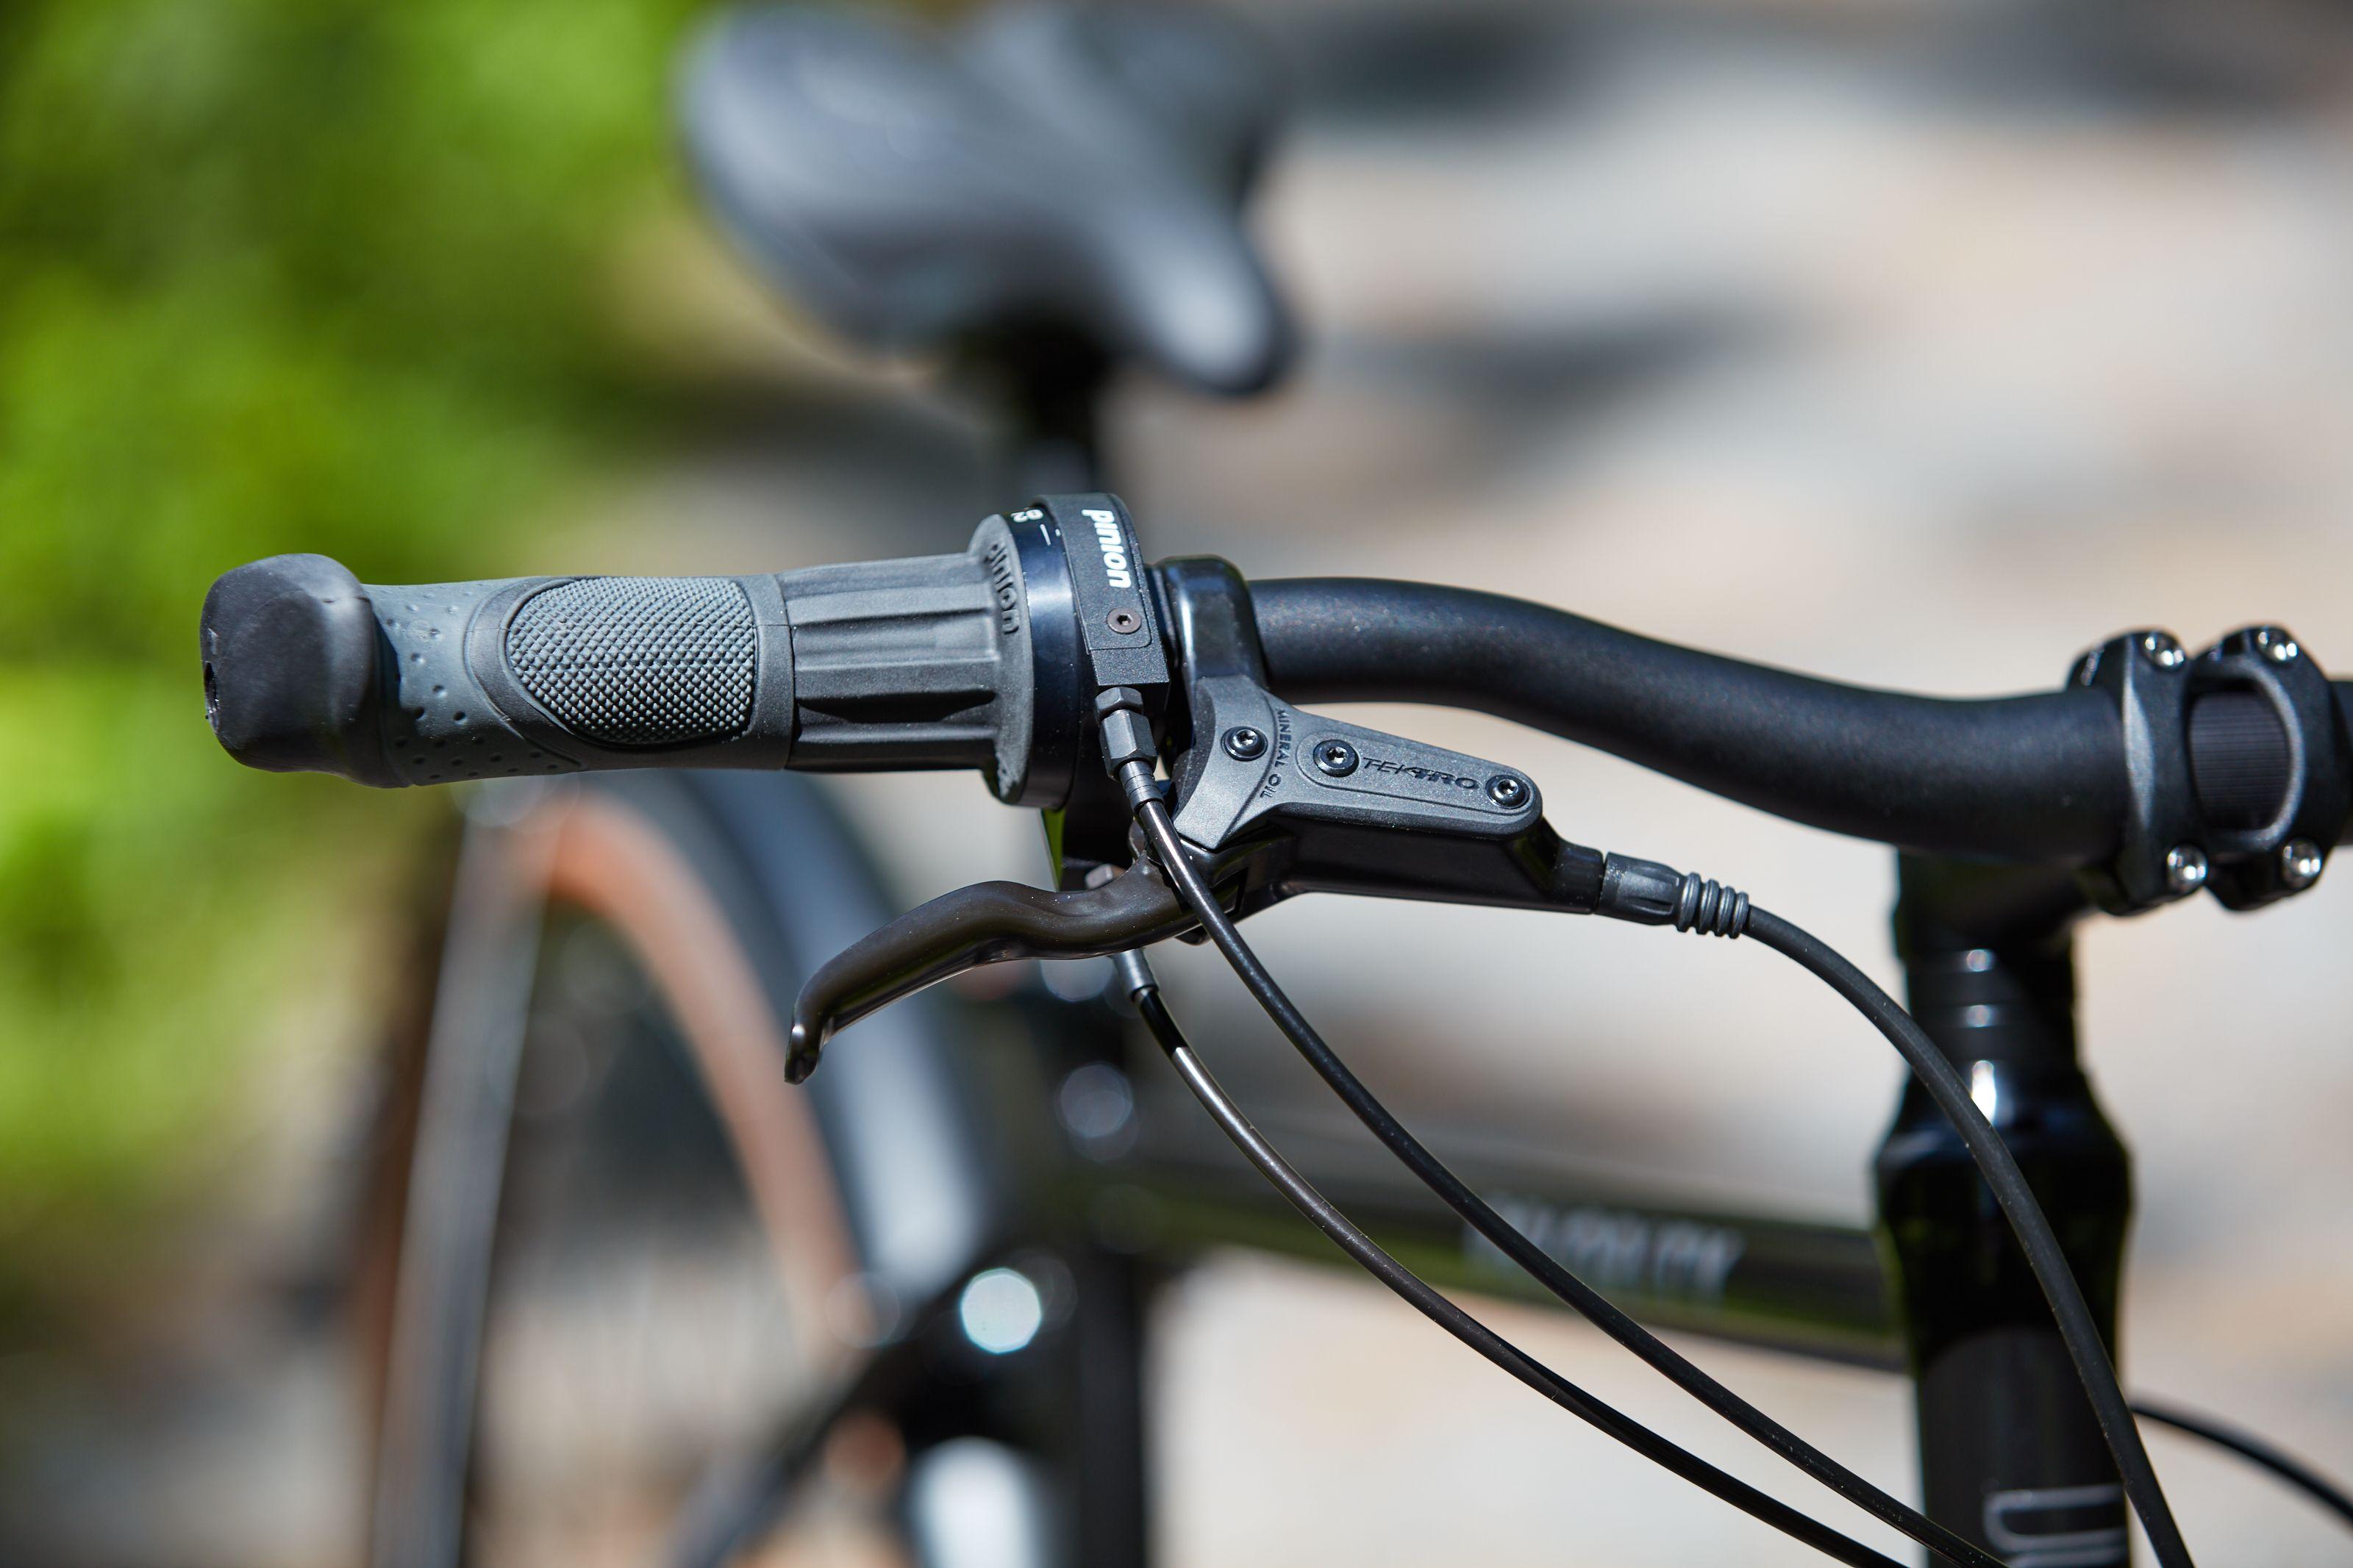 Priority Bicycles 600 City Bike